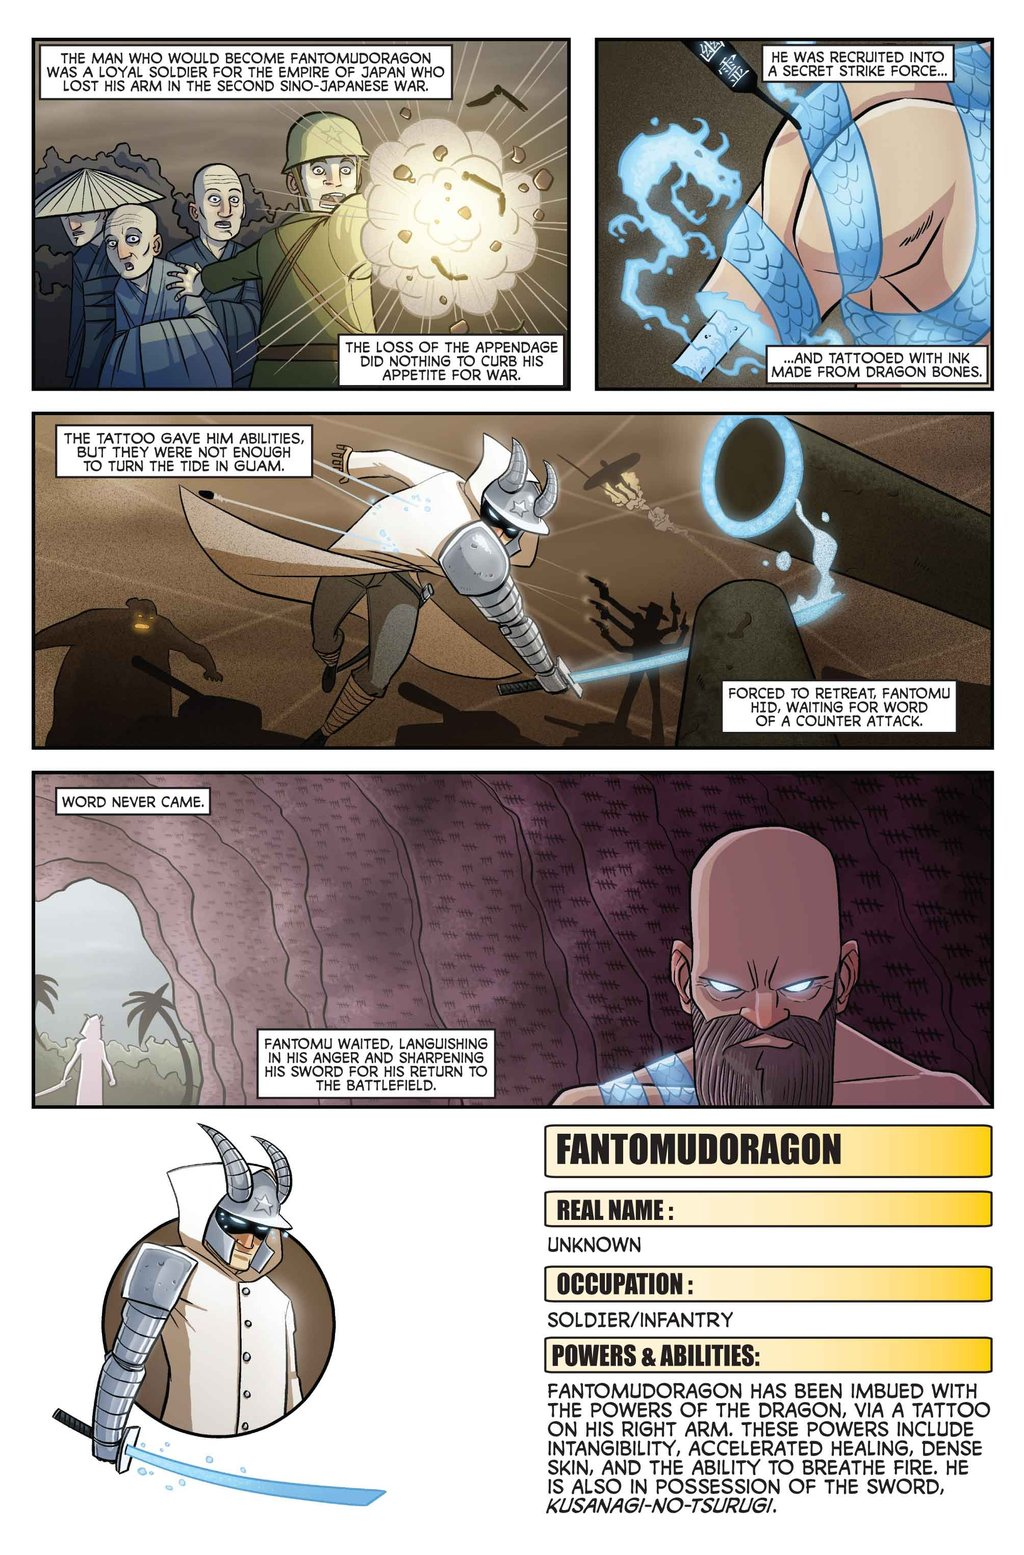 Fantomudoragon Origin Page